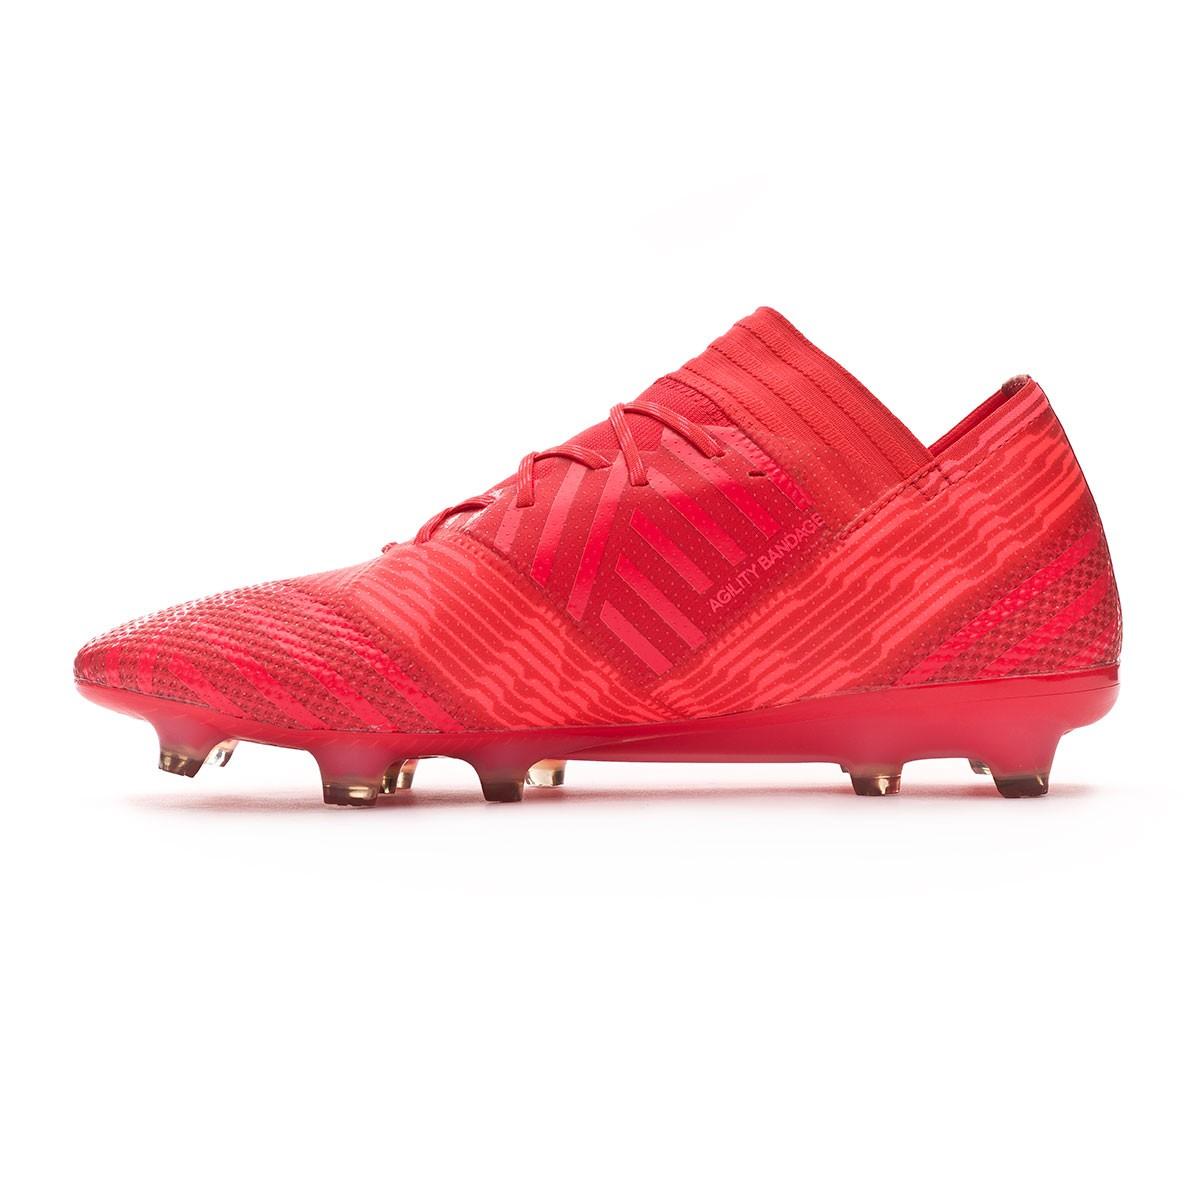 3707e2541aae Football Boots adidas Nemeziz 17.1 FG Real coral-Red zest - Football store  Fútbol Emotion